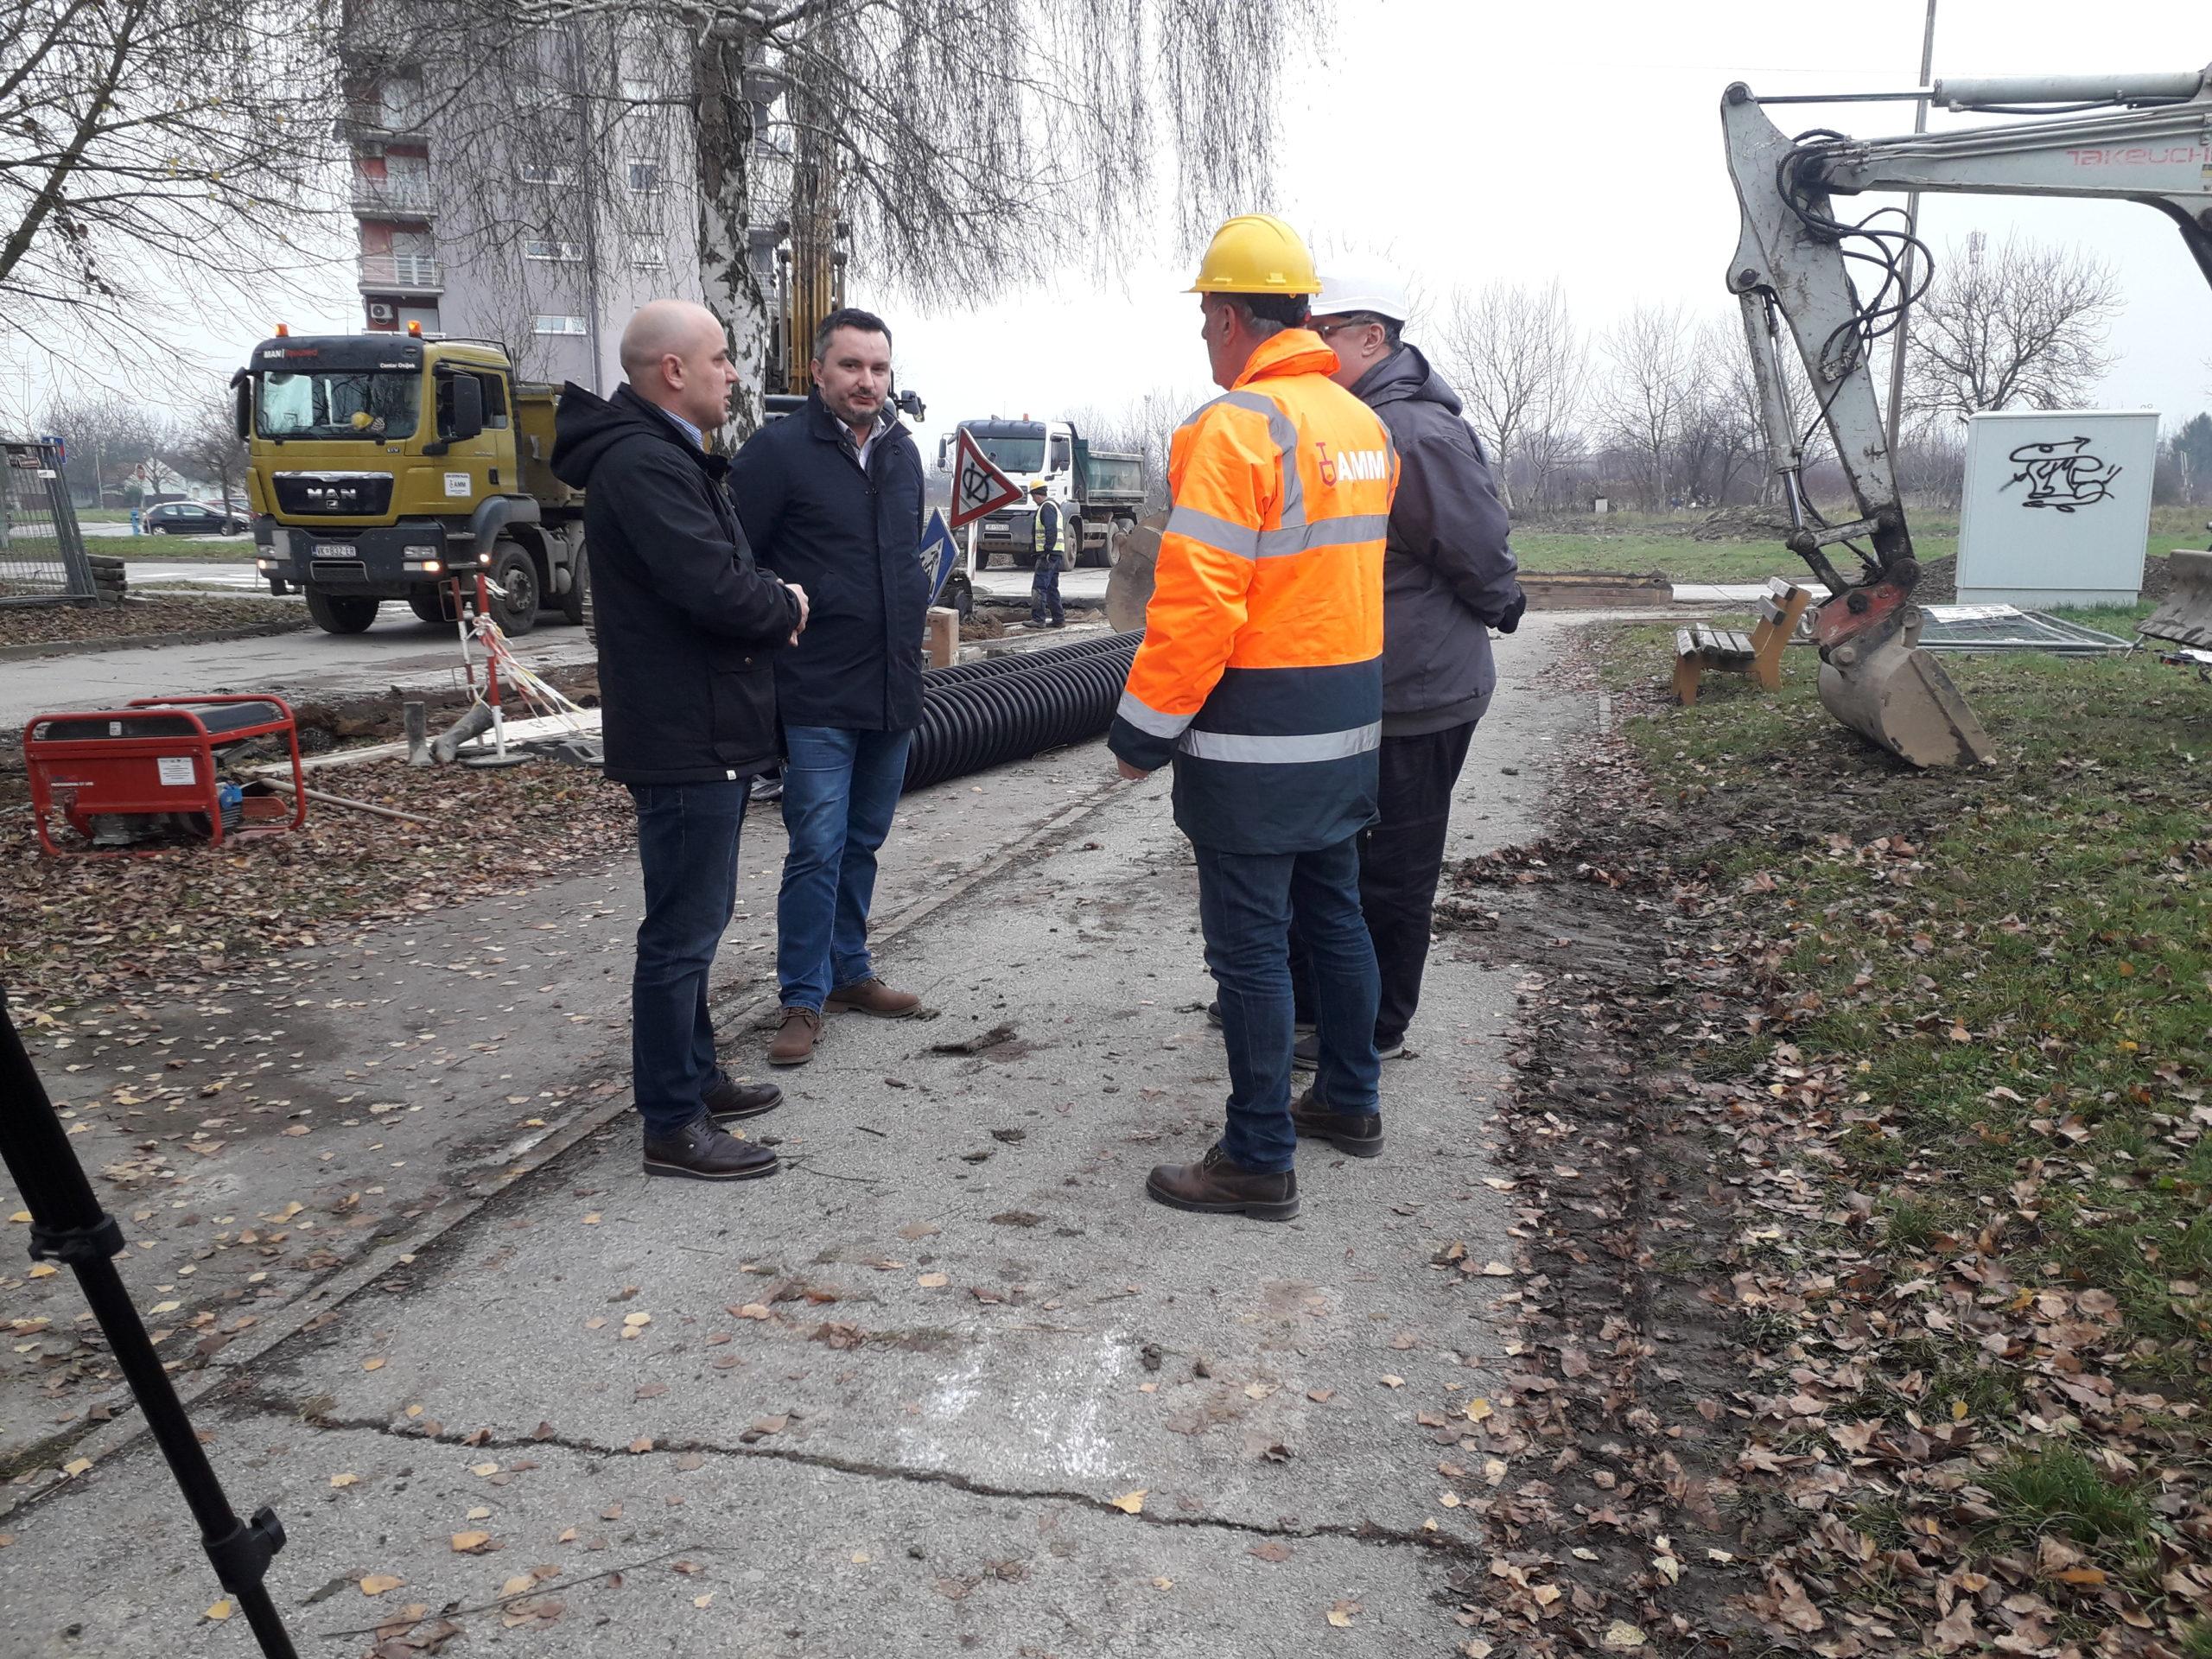 Gradonačelnik Ivan Bosančić obišao radove na Lapovcima